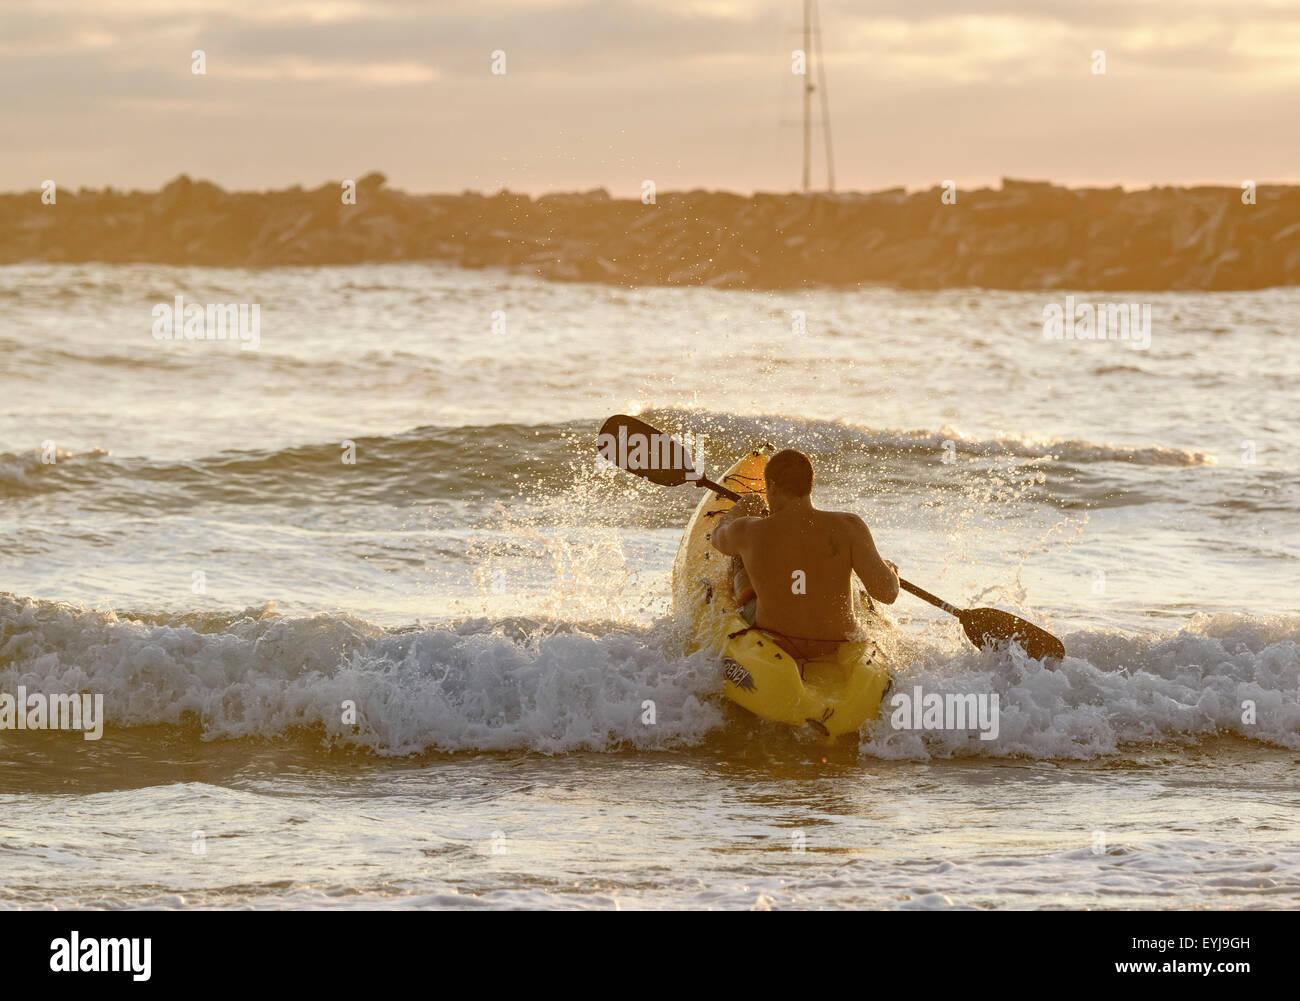 Man kayaking surf at Ocean Beach, CA - Stock Image